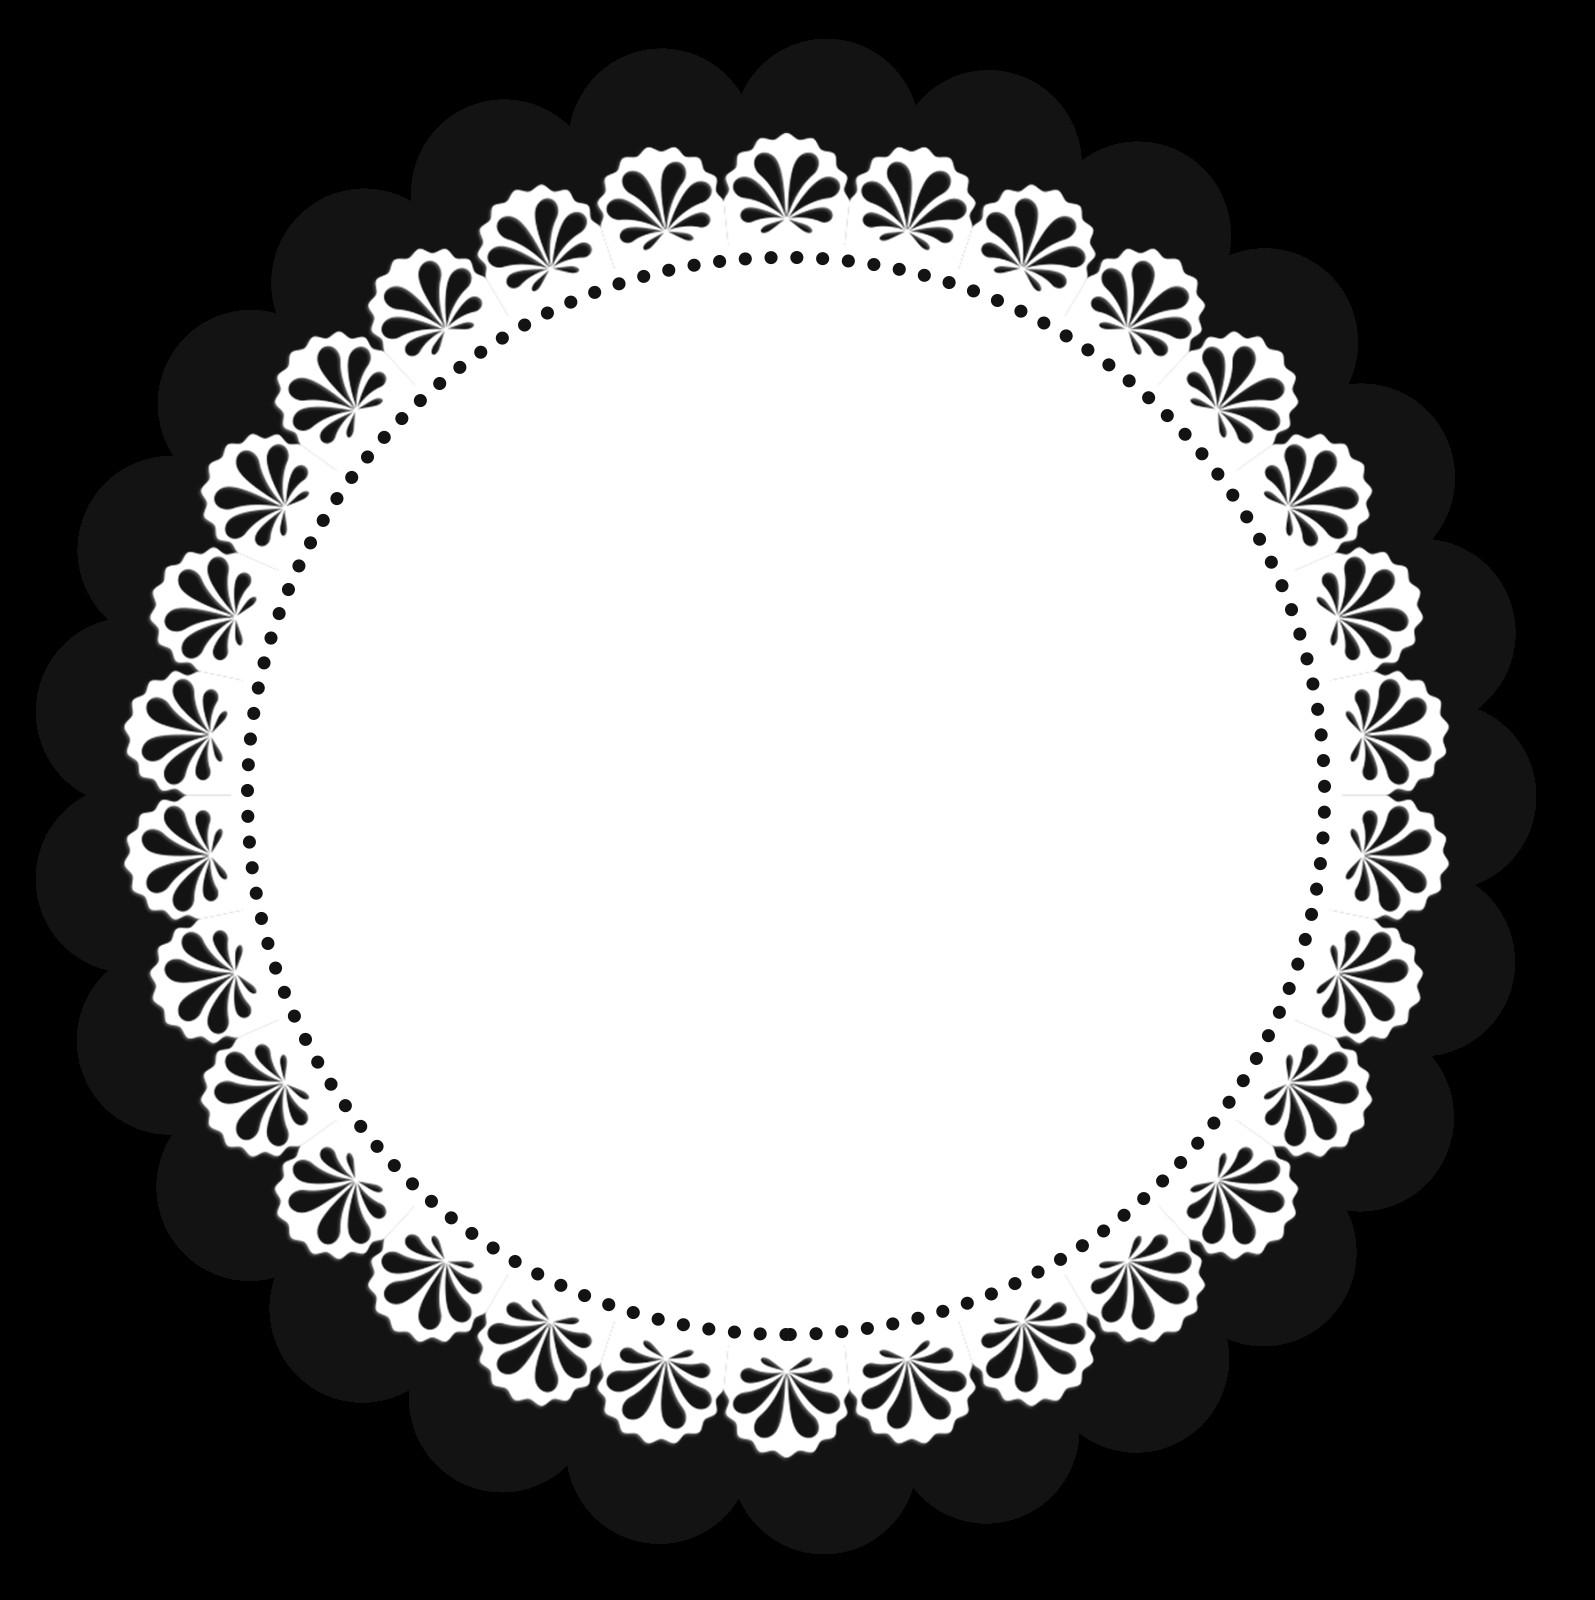 Logotipo Confeitaria Etiquetas Para Doces Etiquetas Artesanais Etiquetas Adesivas Adesivos Para Imprimir